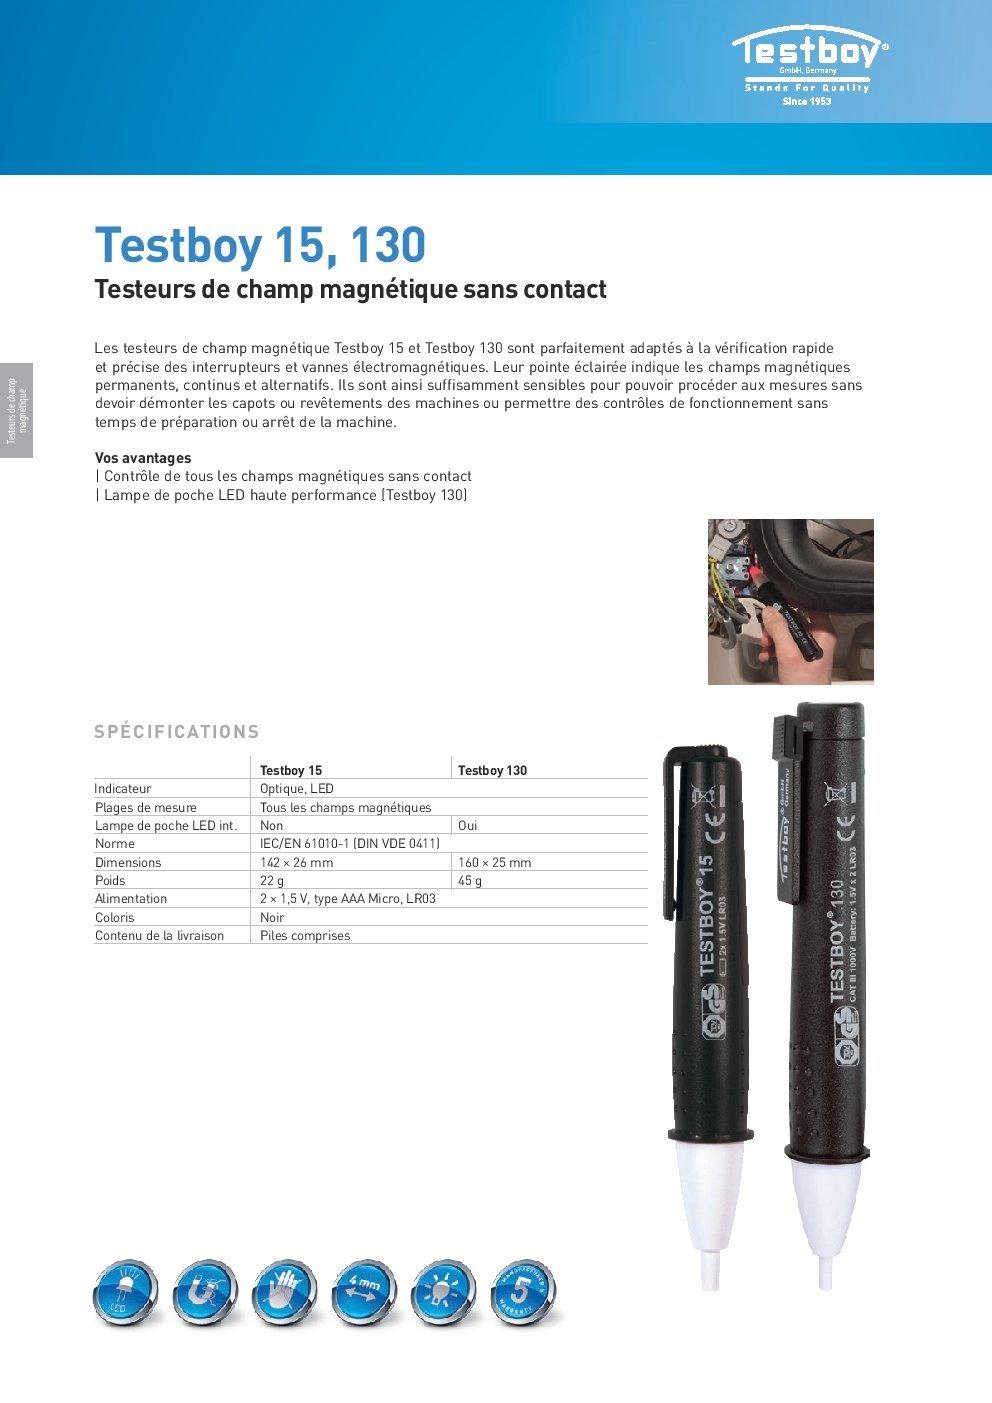 Testboy 130